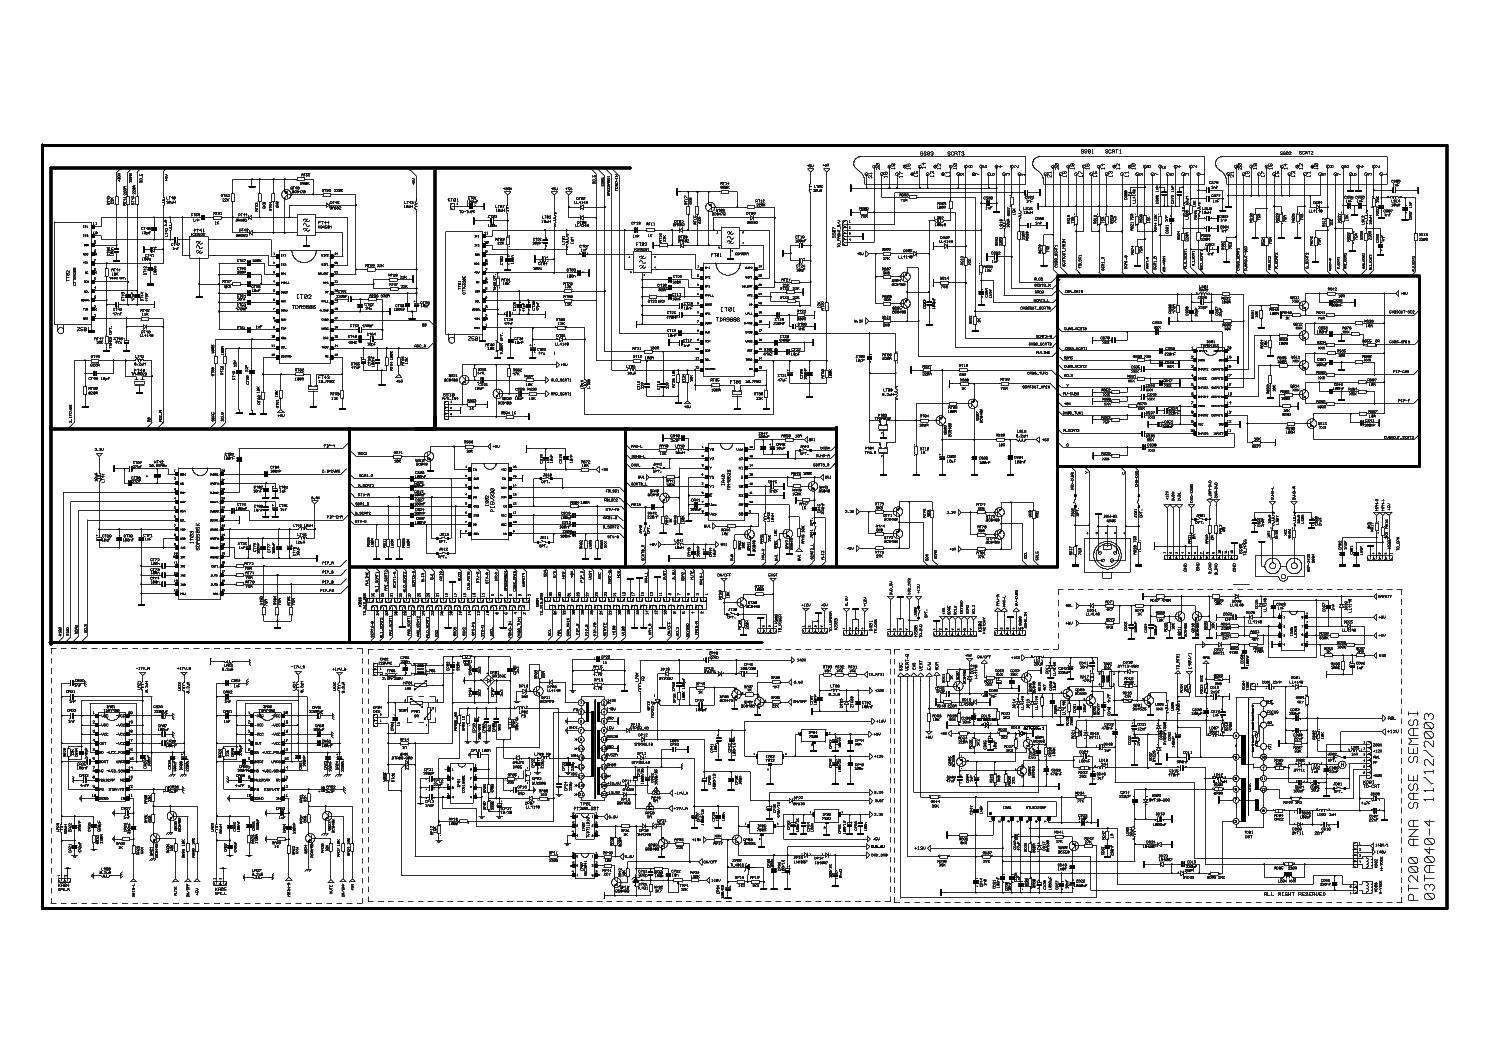 Diagram  Schematic Diagram Manual Viewsonic 1564a Monitor Full Version Hd Quality 1564a Monitor